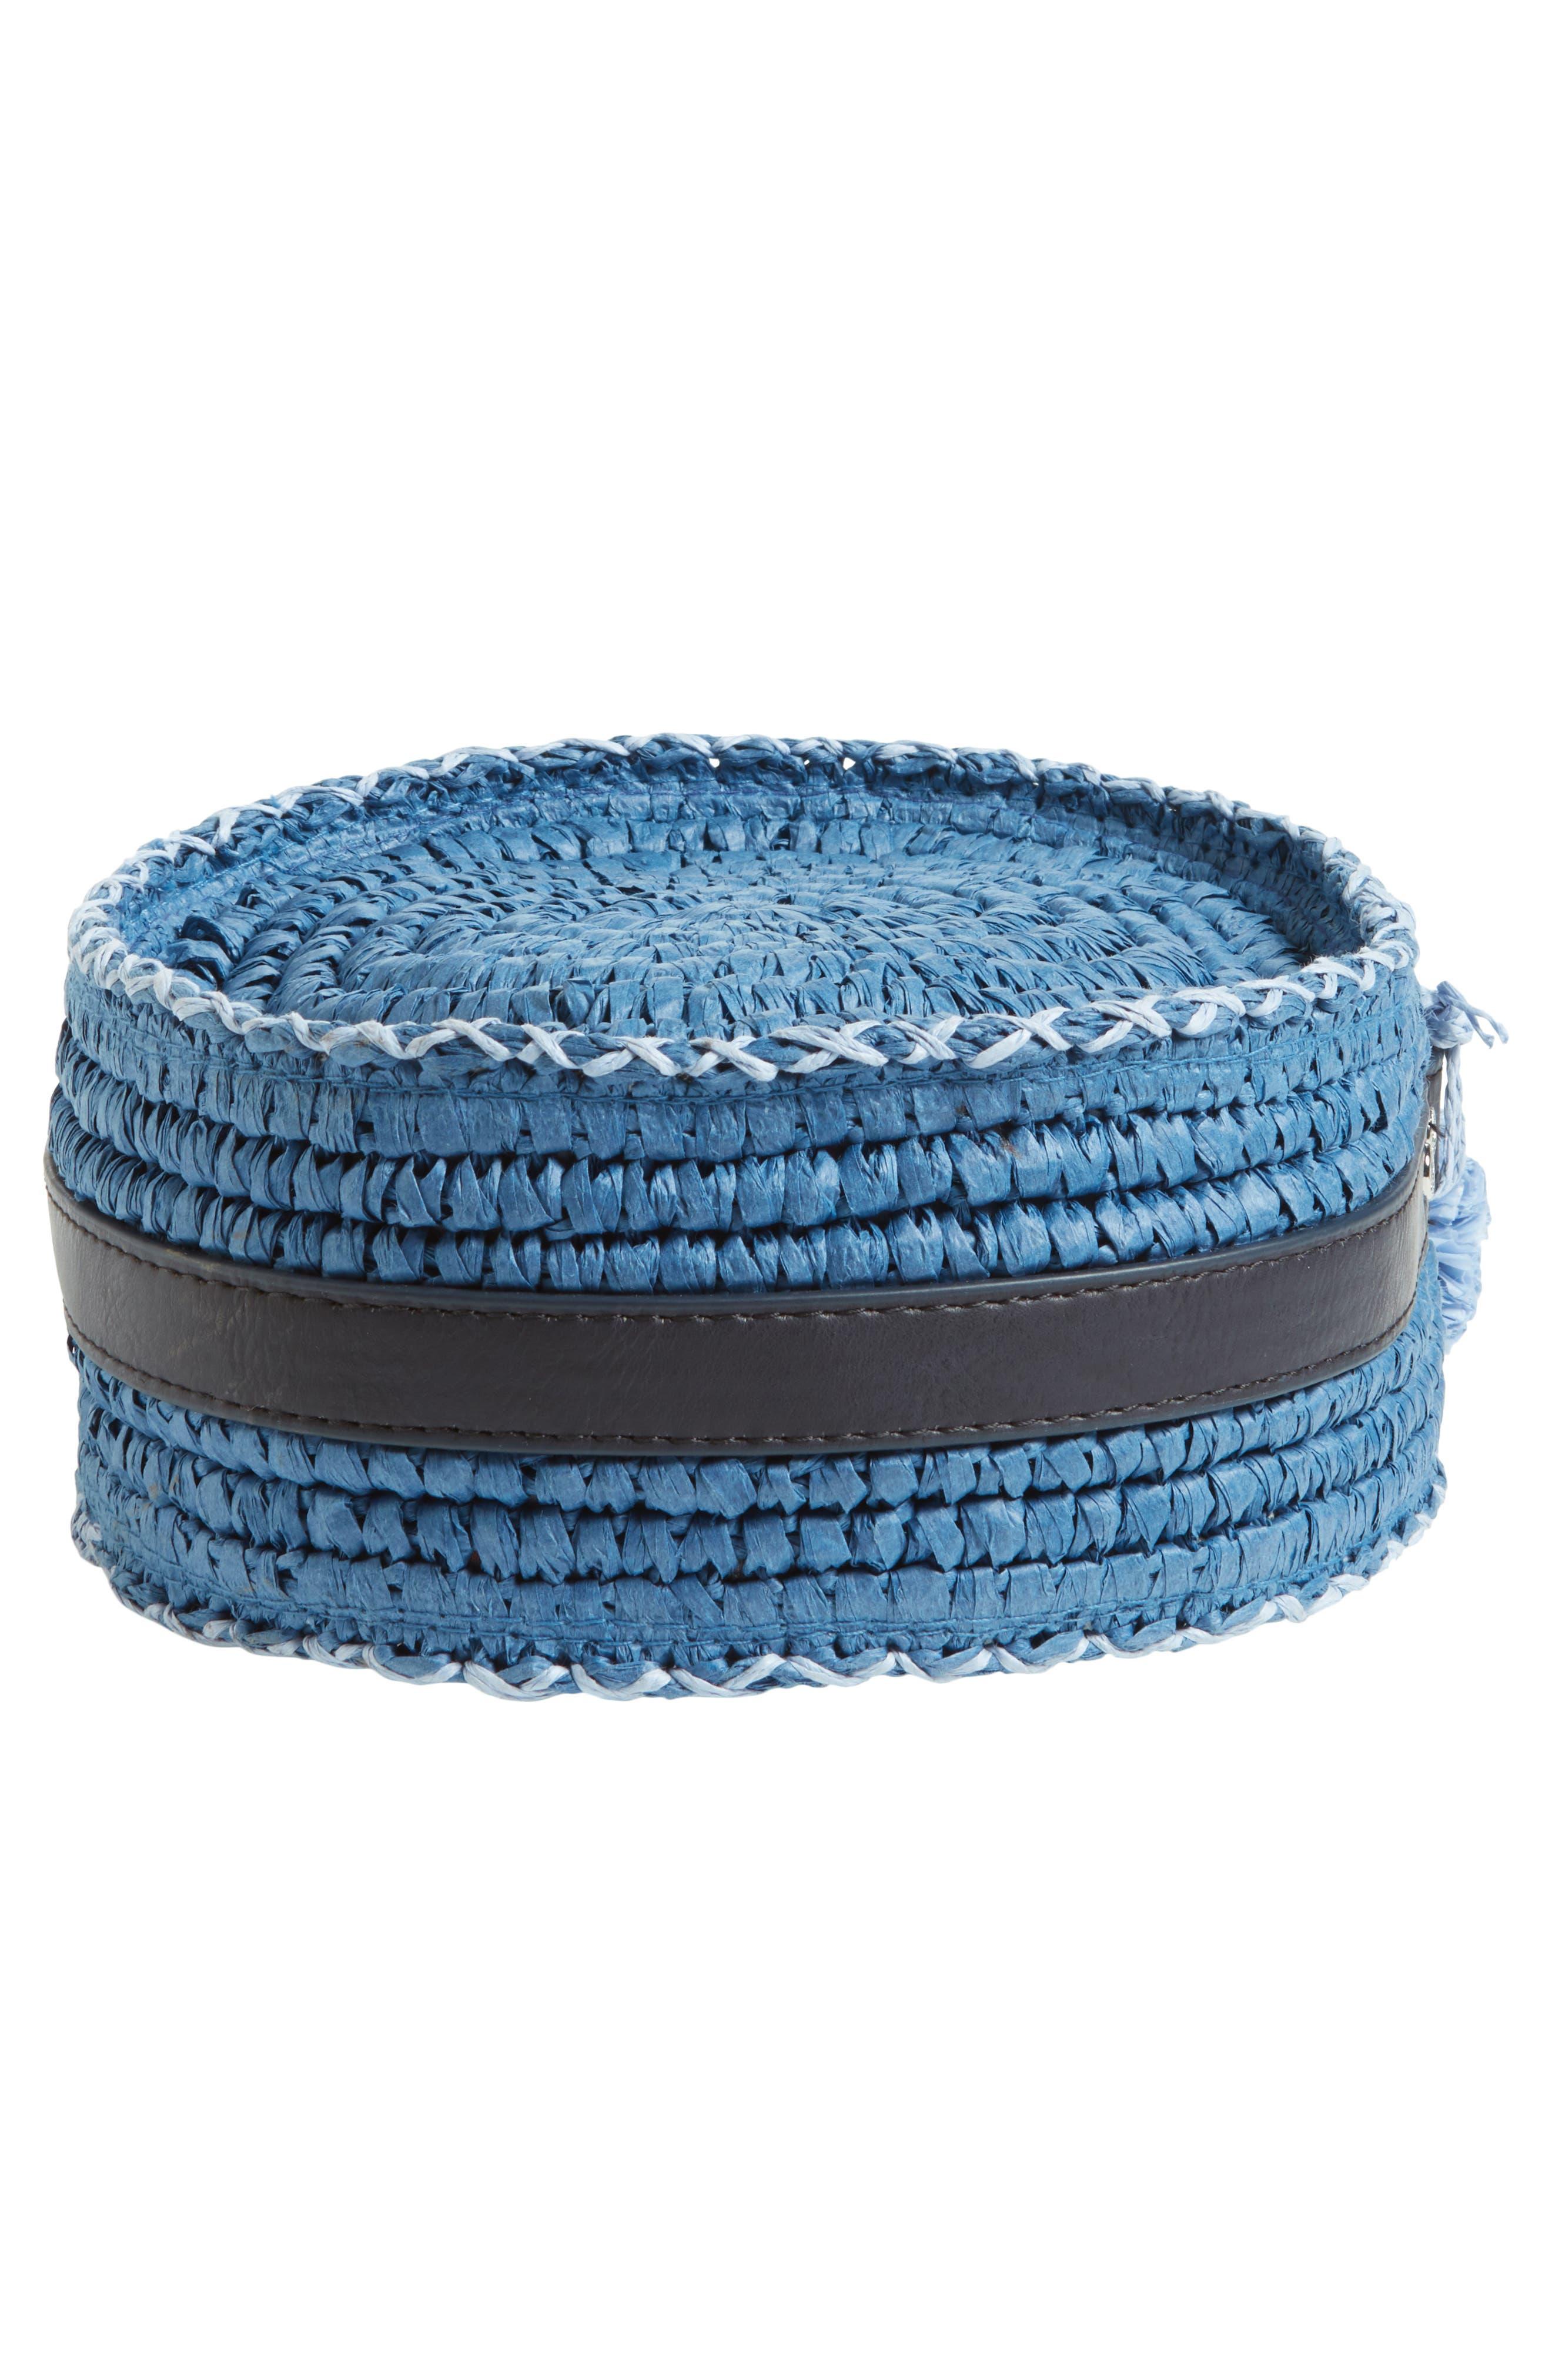 Pirro Woven Straw Crossbody Bag,                             Alternate thumbnail 6, color,                             Navy